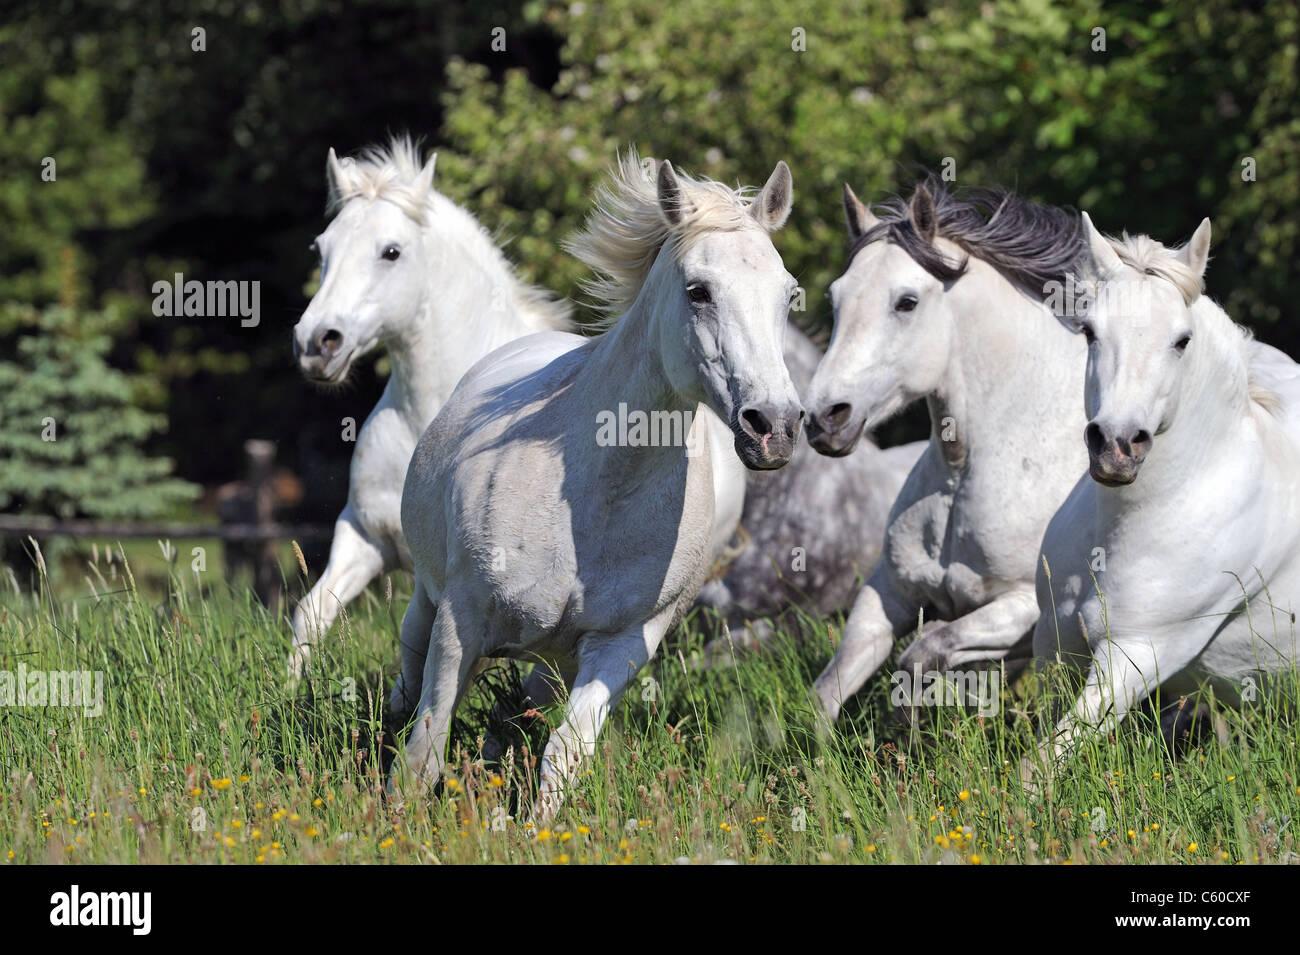 Connemara Pony (Equus ferus caballus), herd in gallop on a meadow. - Stock Image